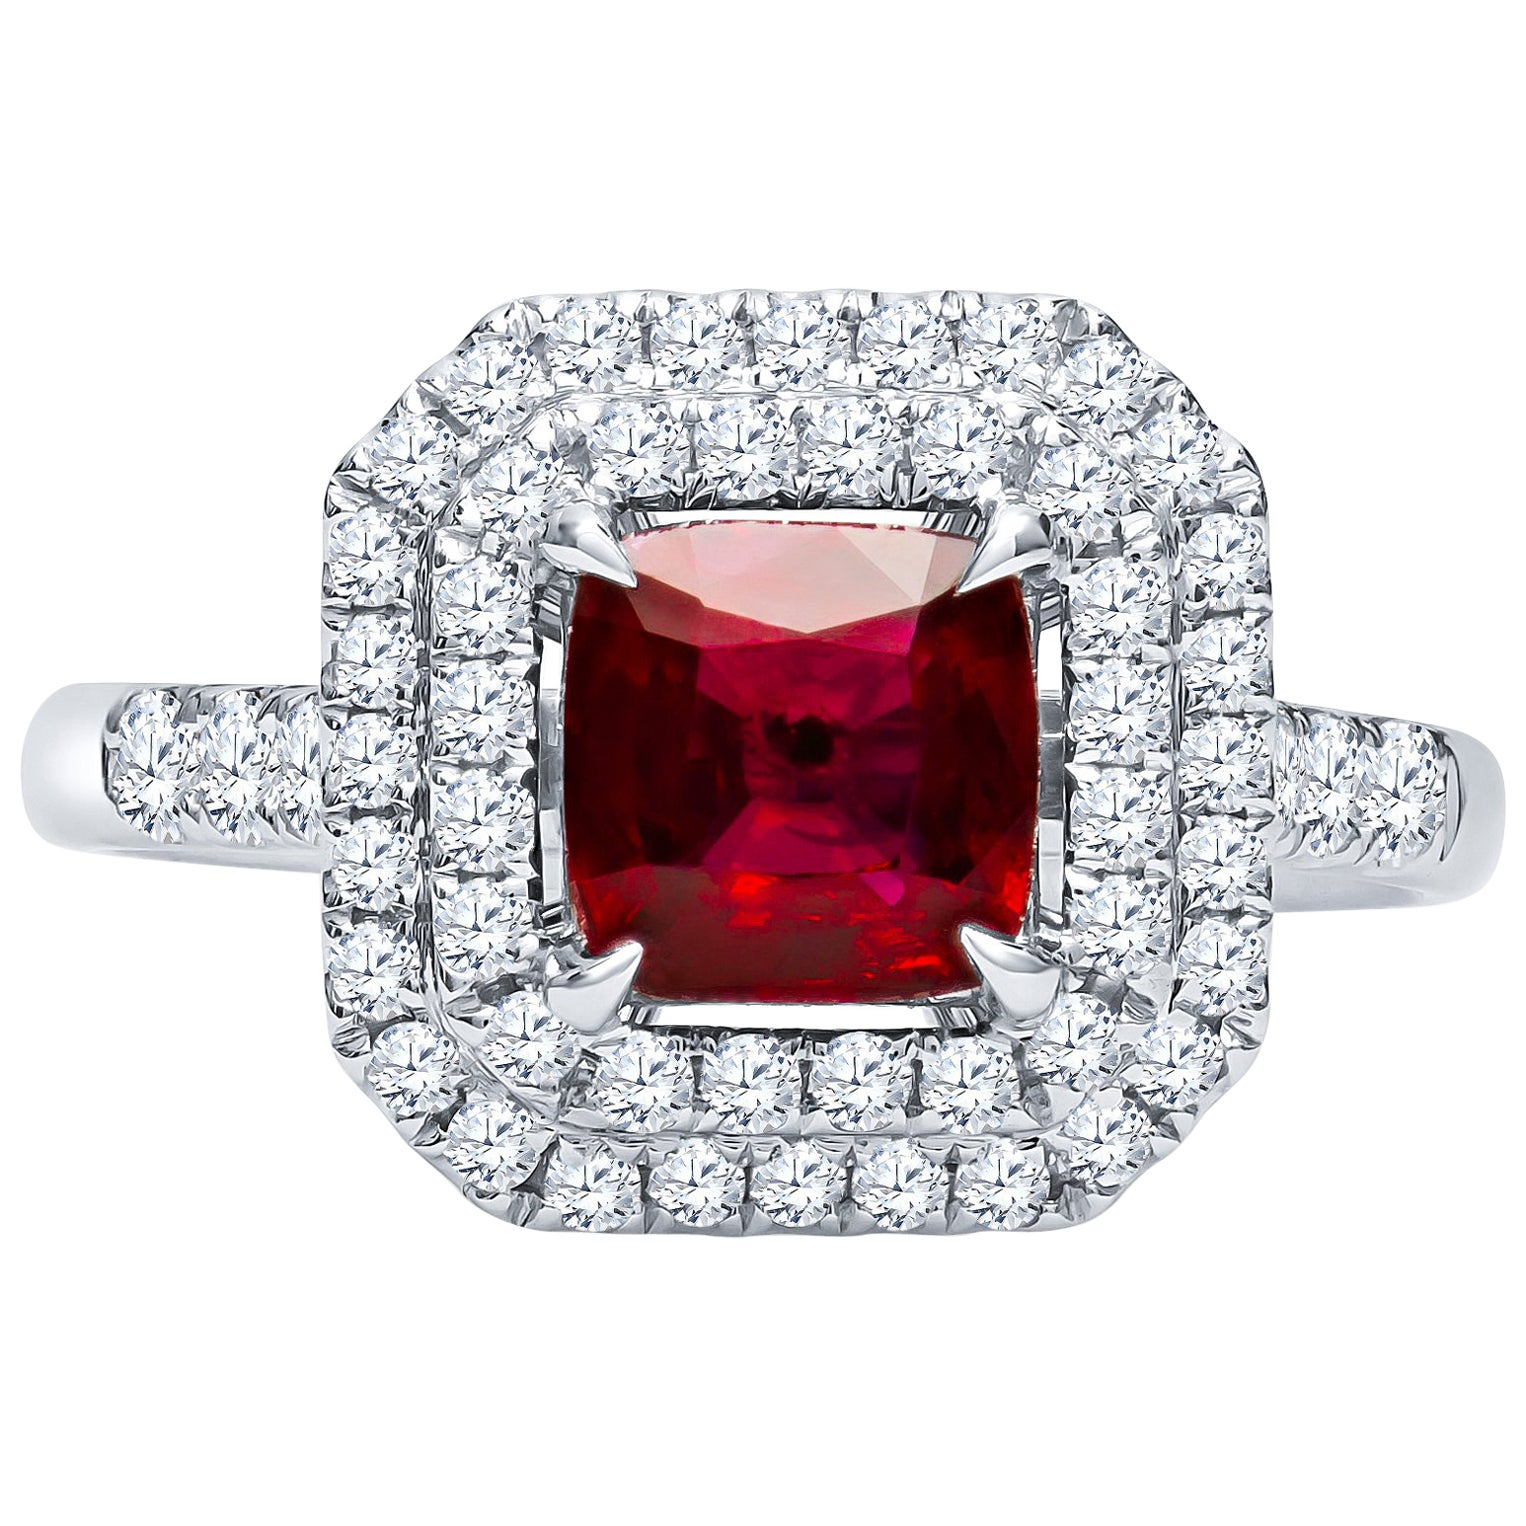 1.40 Carat Cushion Cut Natural Ruby 'IGI' Ring with 0.63 Carat in Diamonds